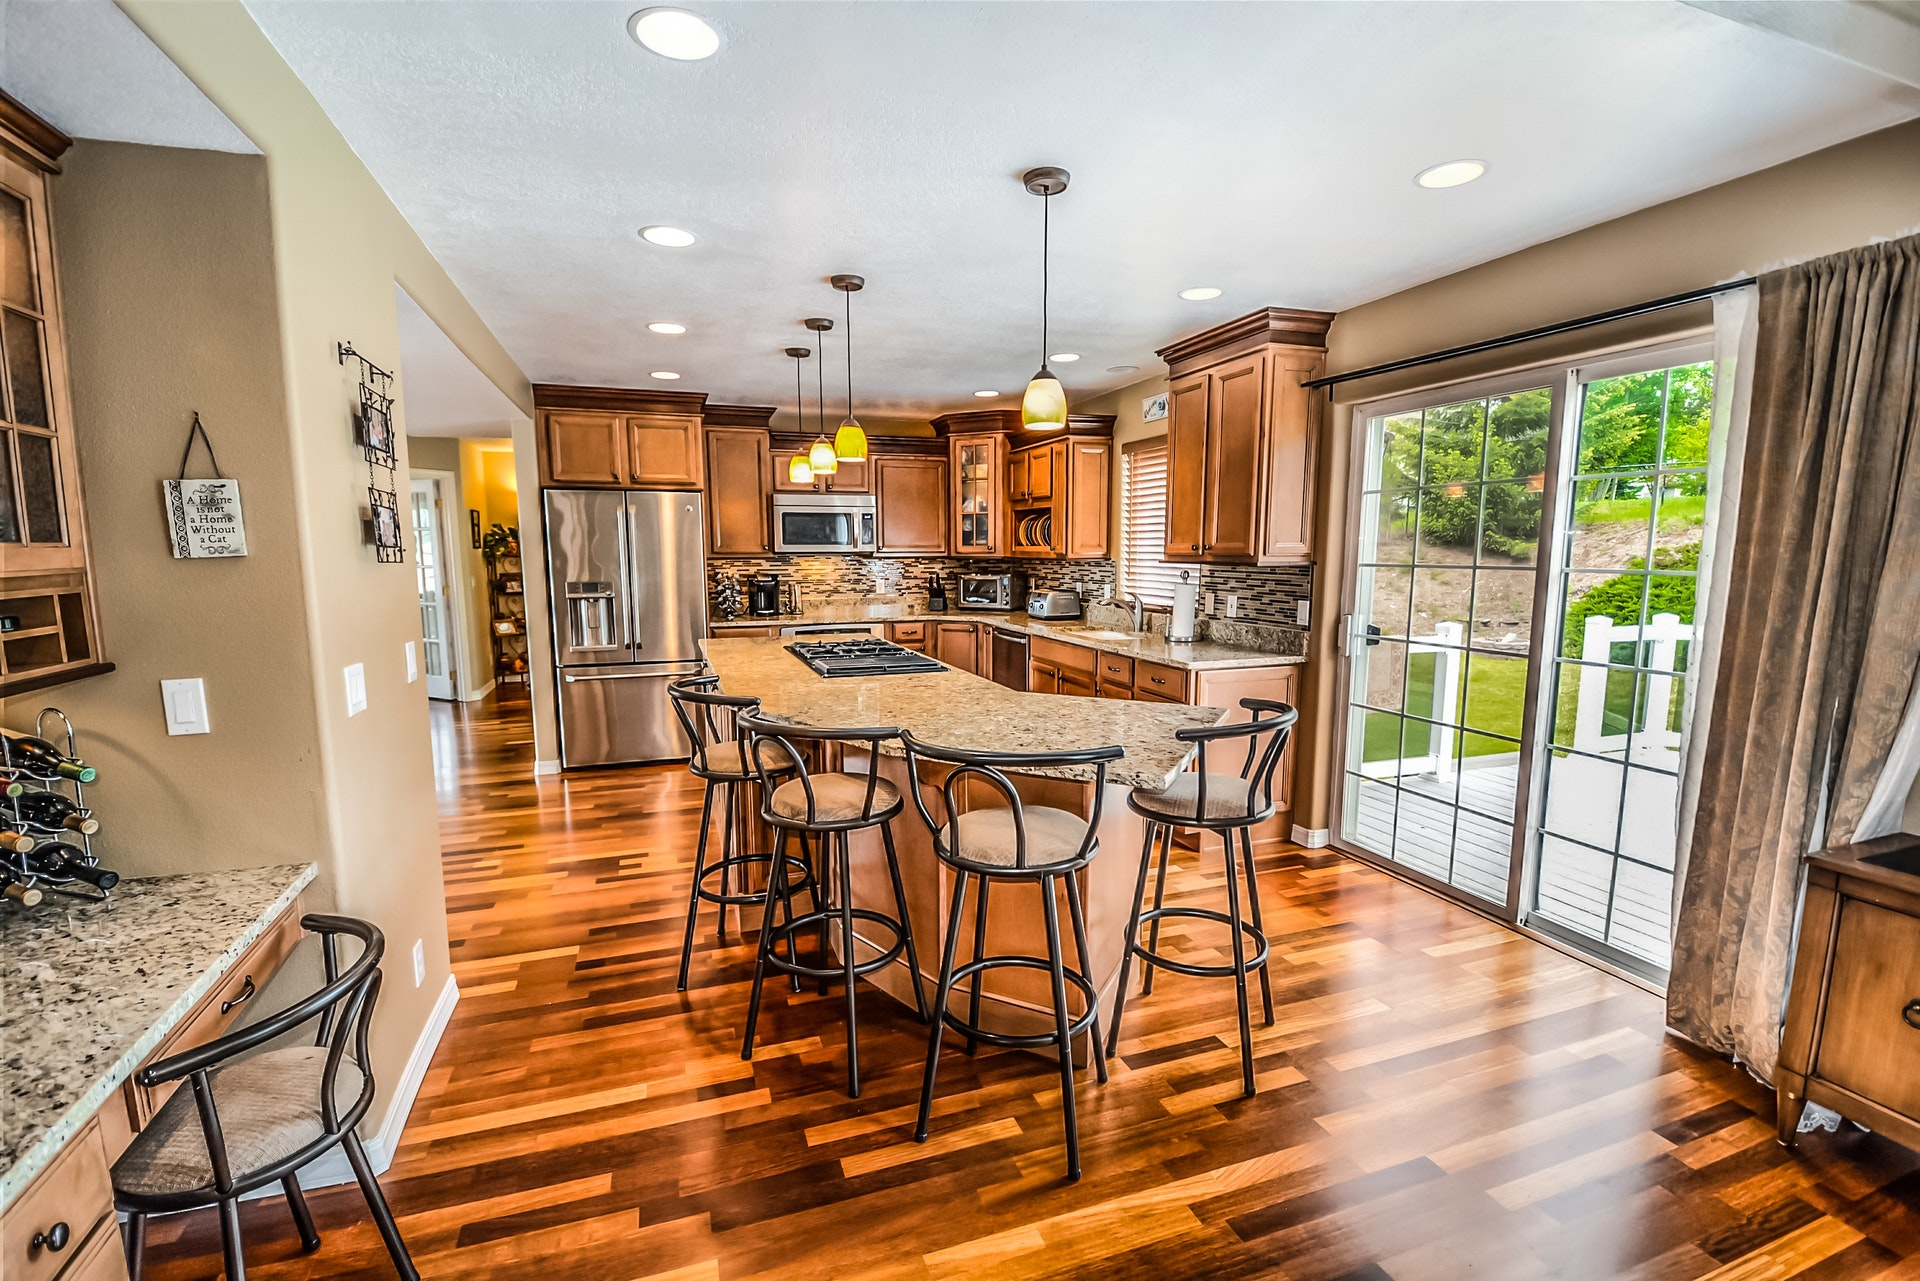 The Surprising Benefits of Dark Wood Flooring